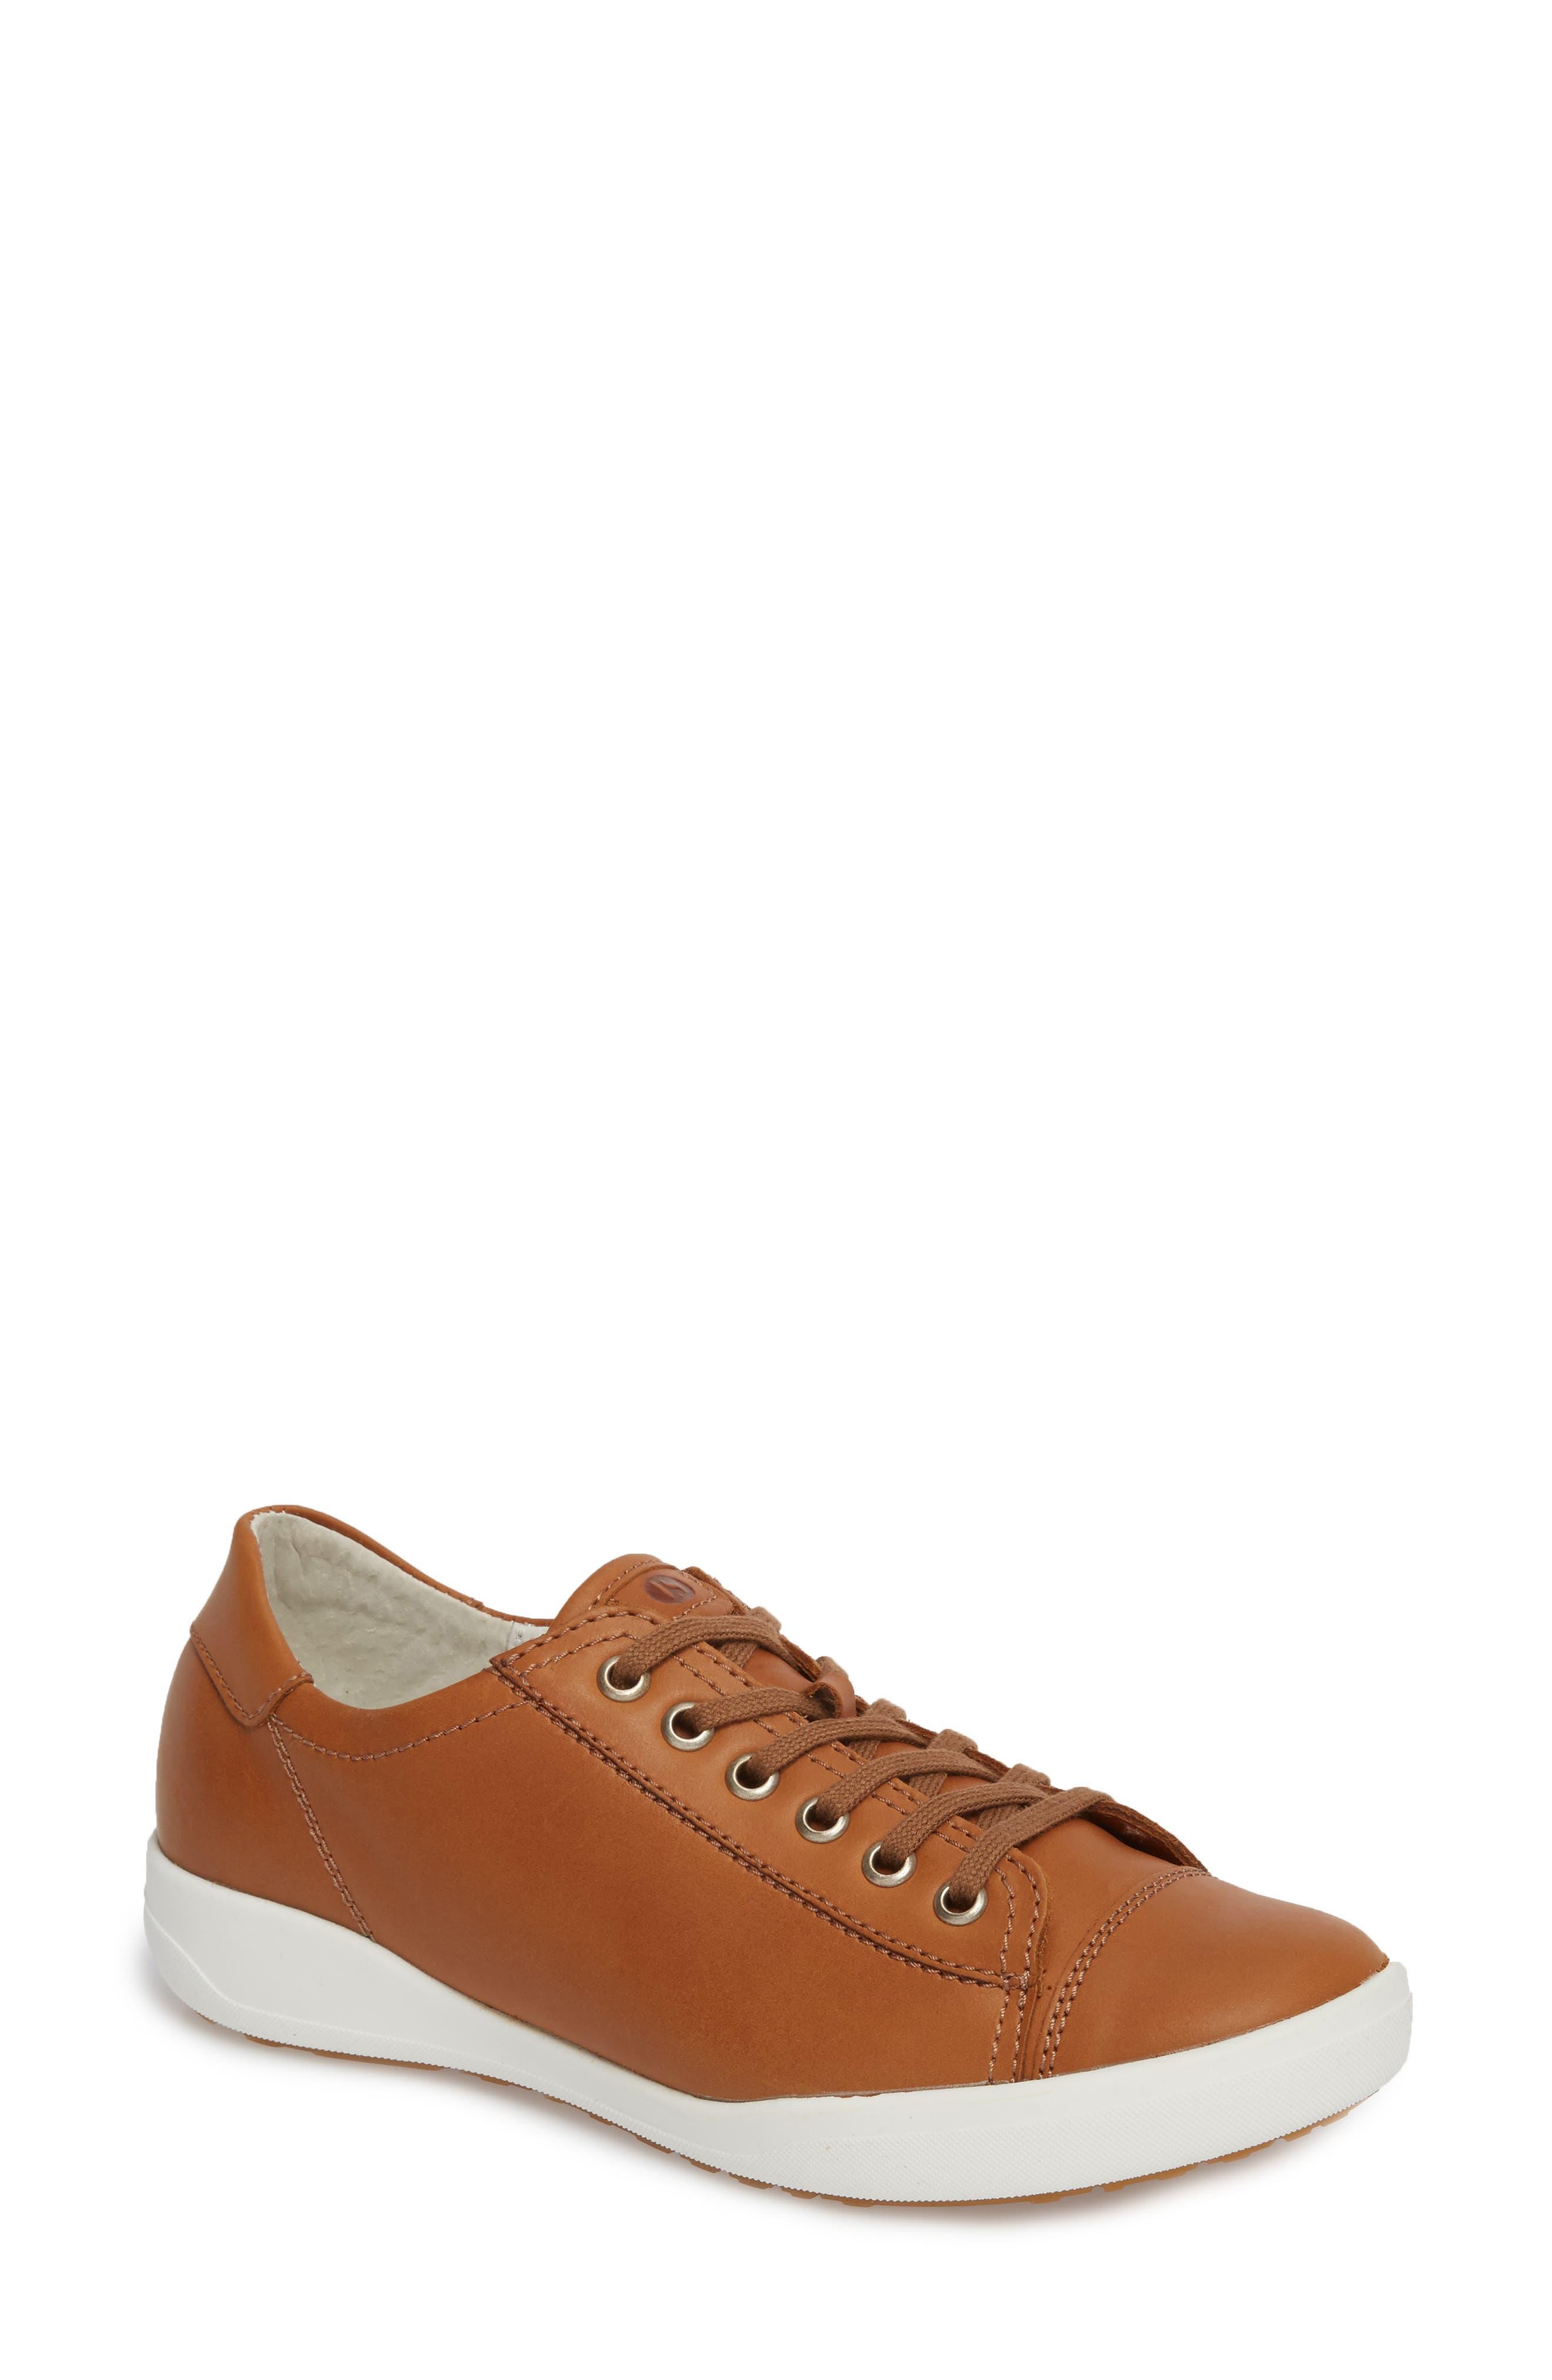 Josef Seibel Sina 11 Sneaker, Brown